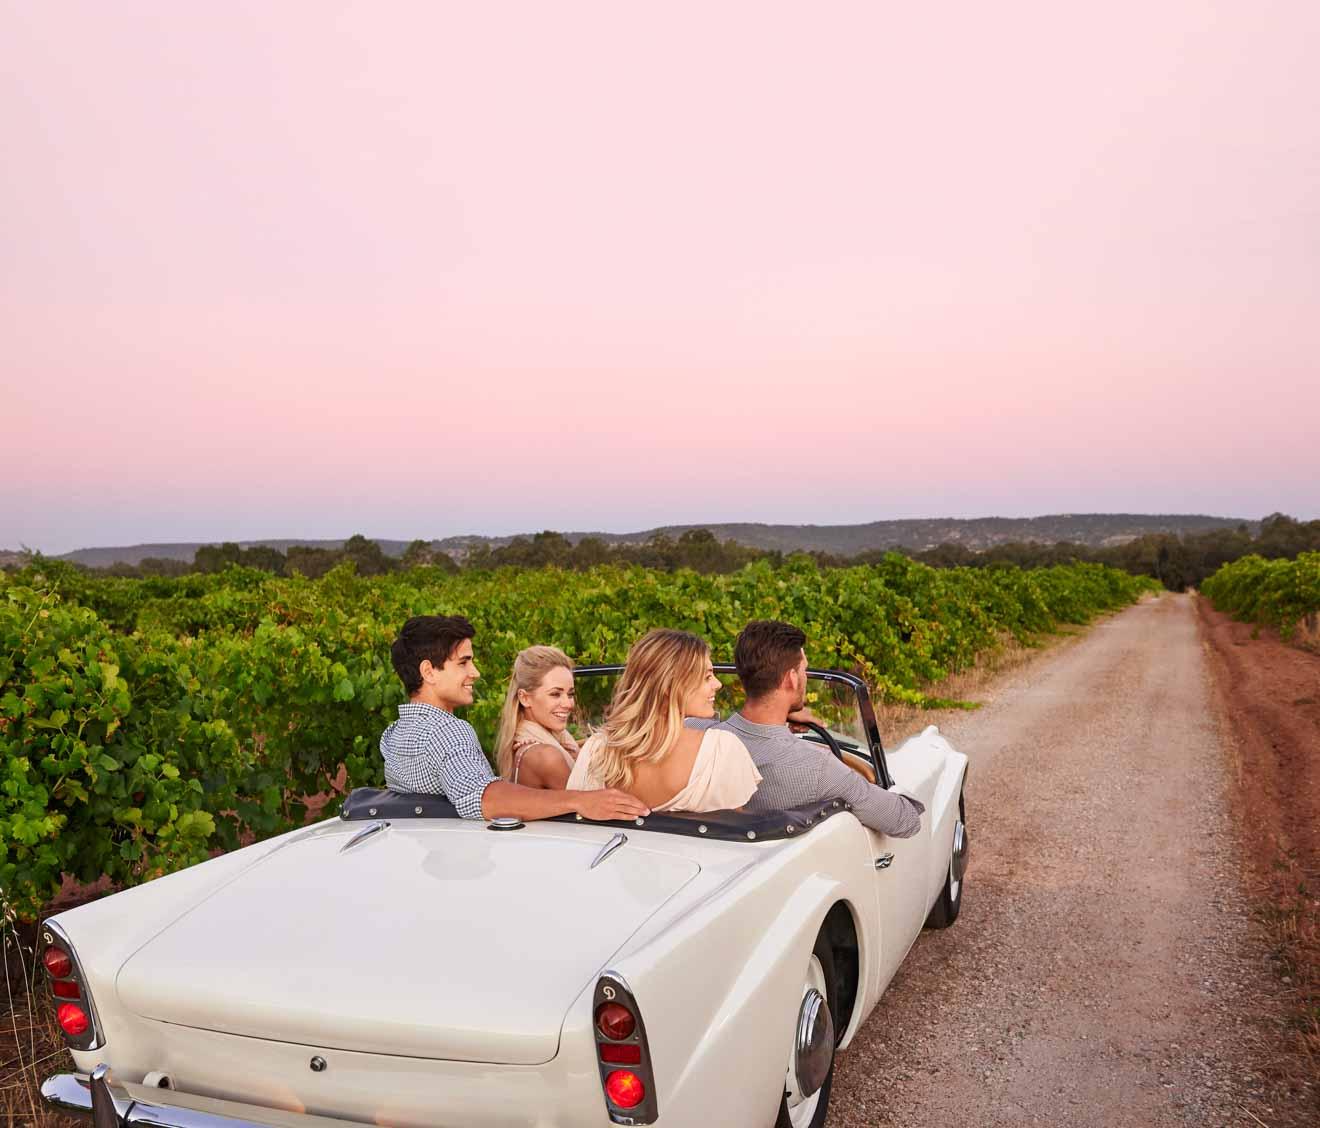 itinerario de la ruta del vino del valle del cisne